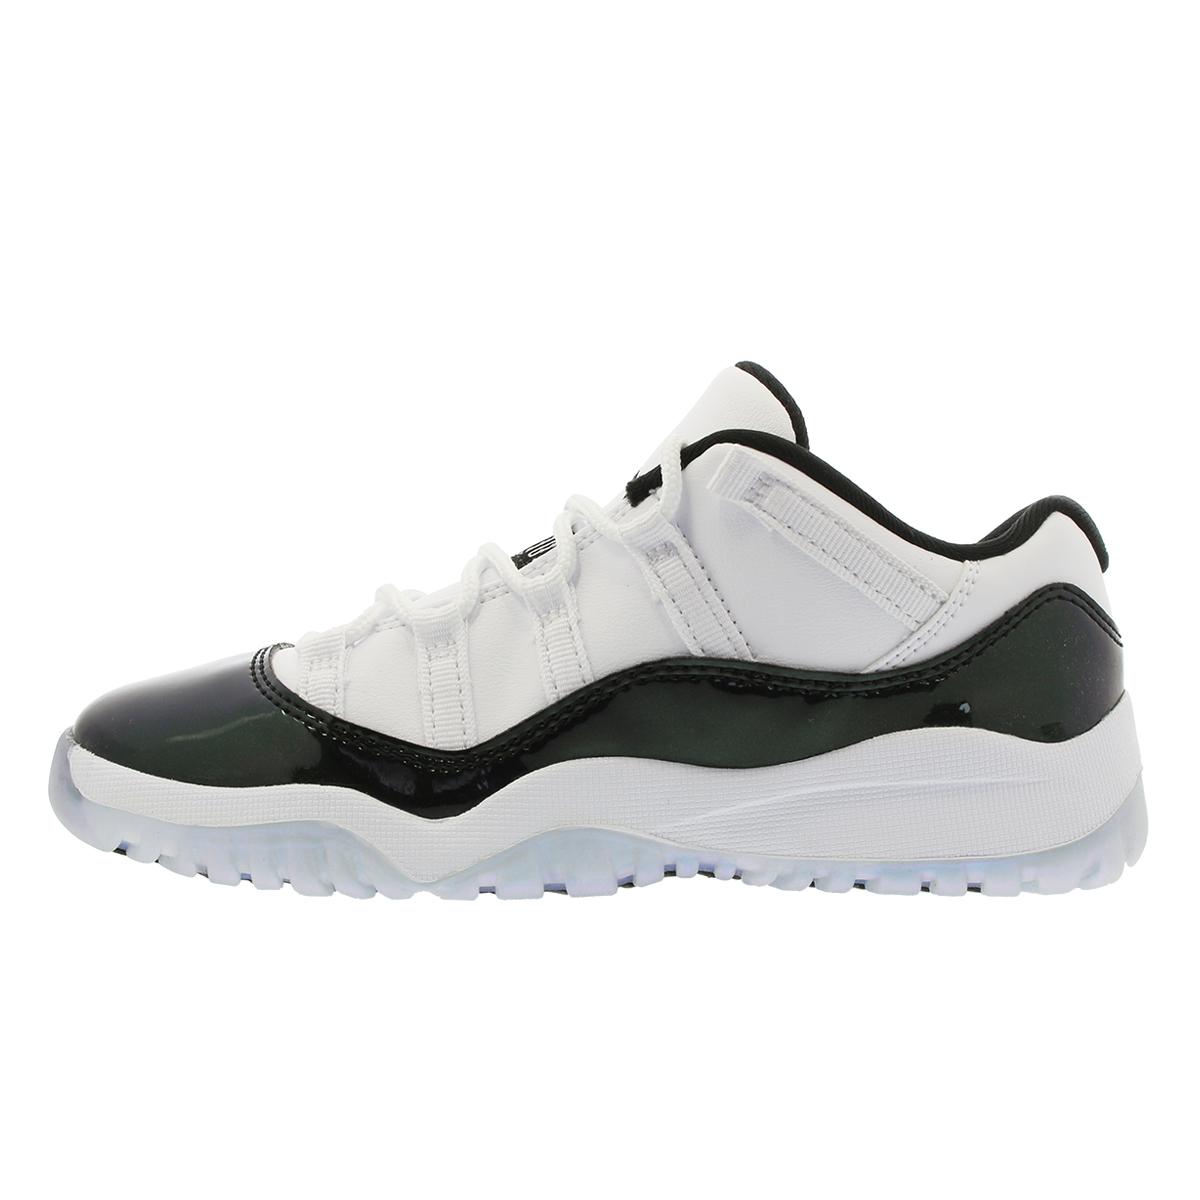 Select Shop Lowtex Nike Air Jordan 11 Retro Low Bp耐吉空氣喬丹